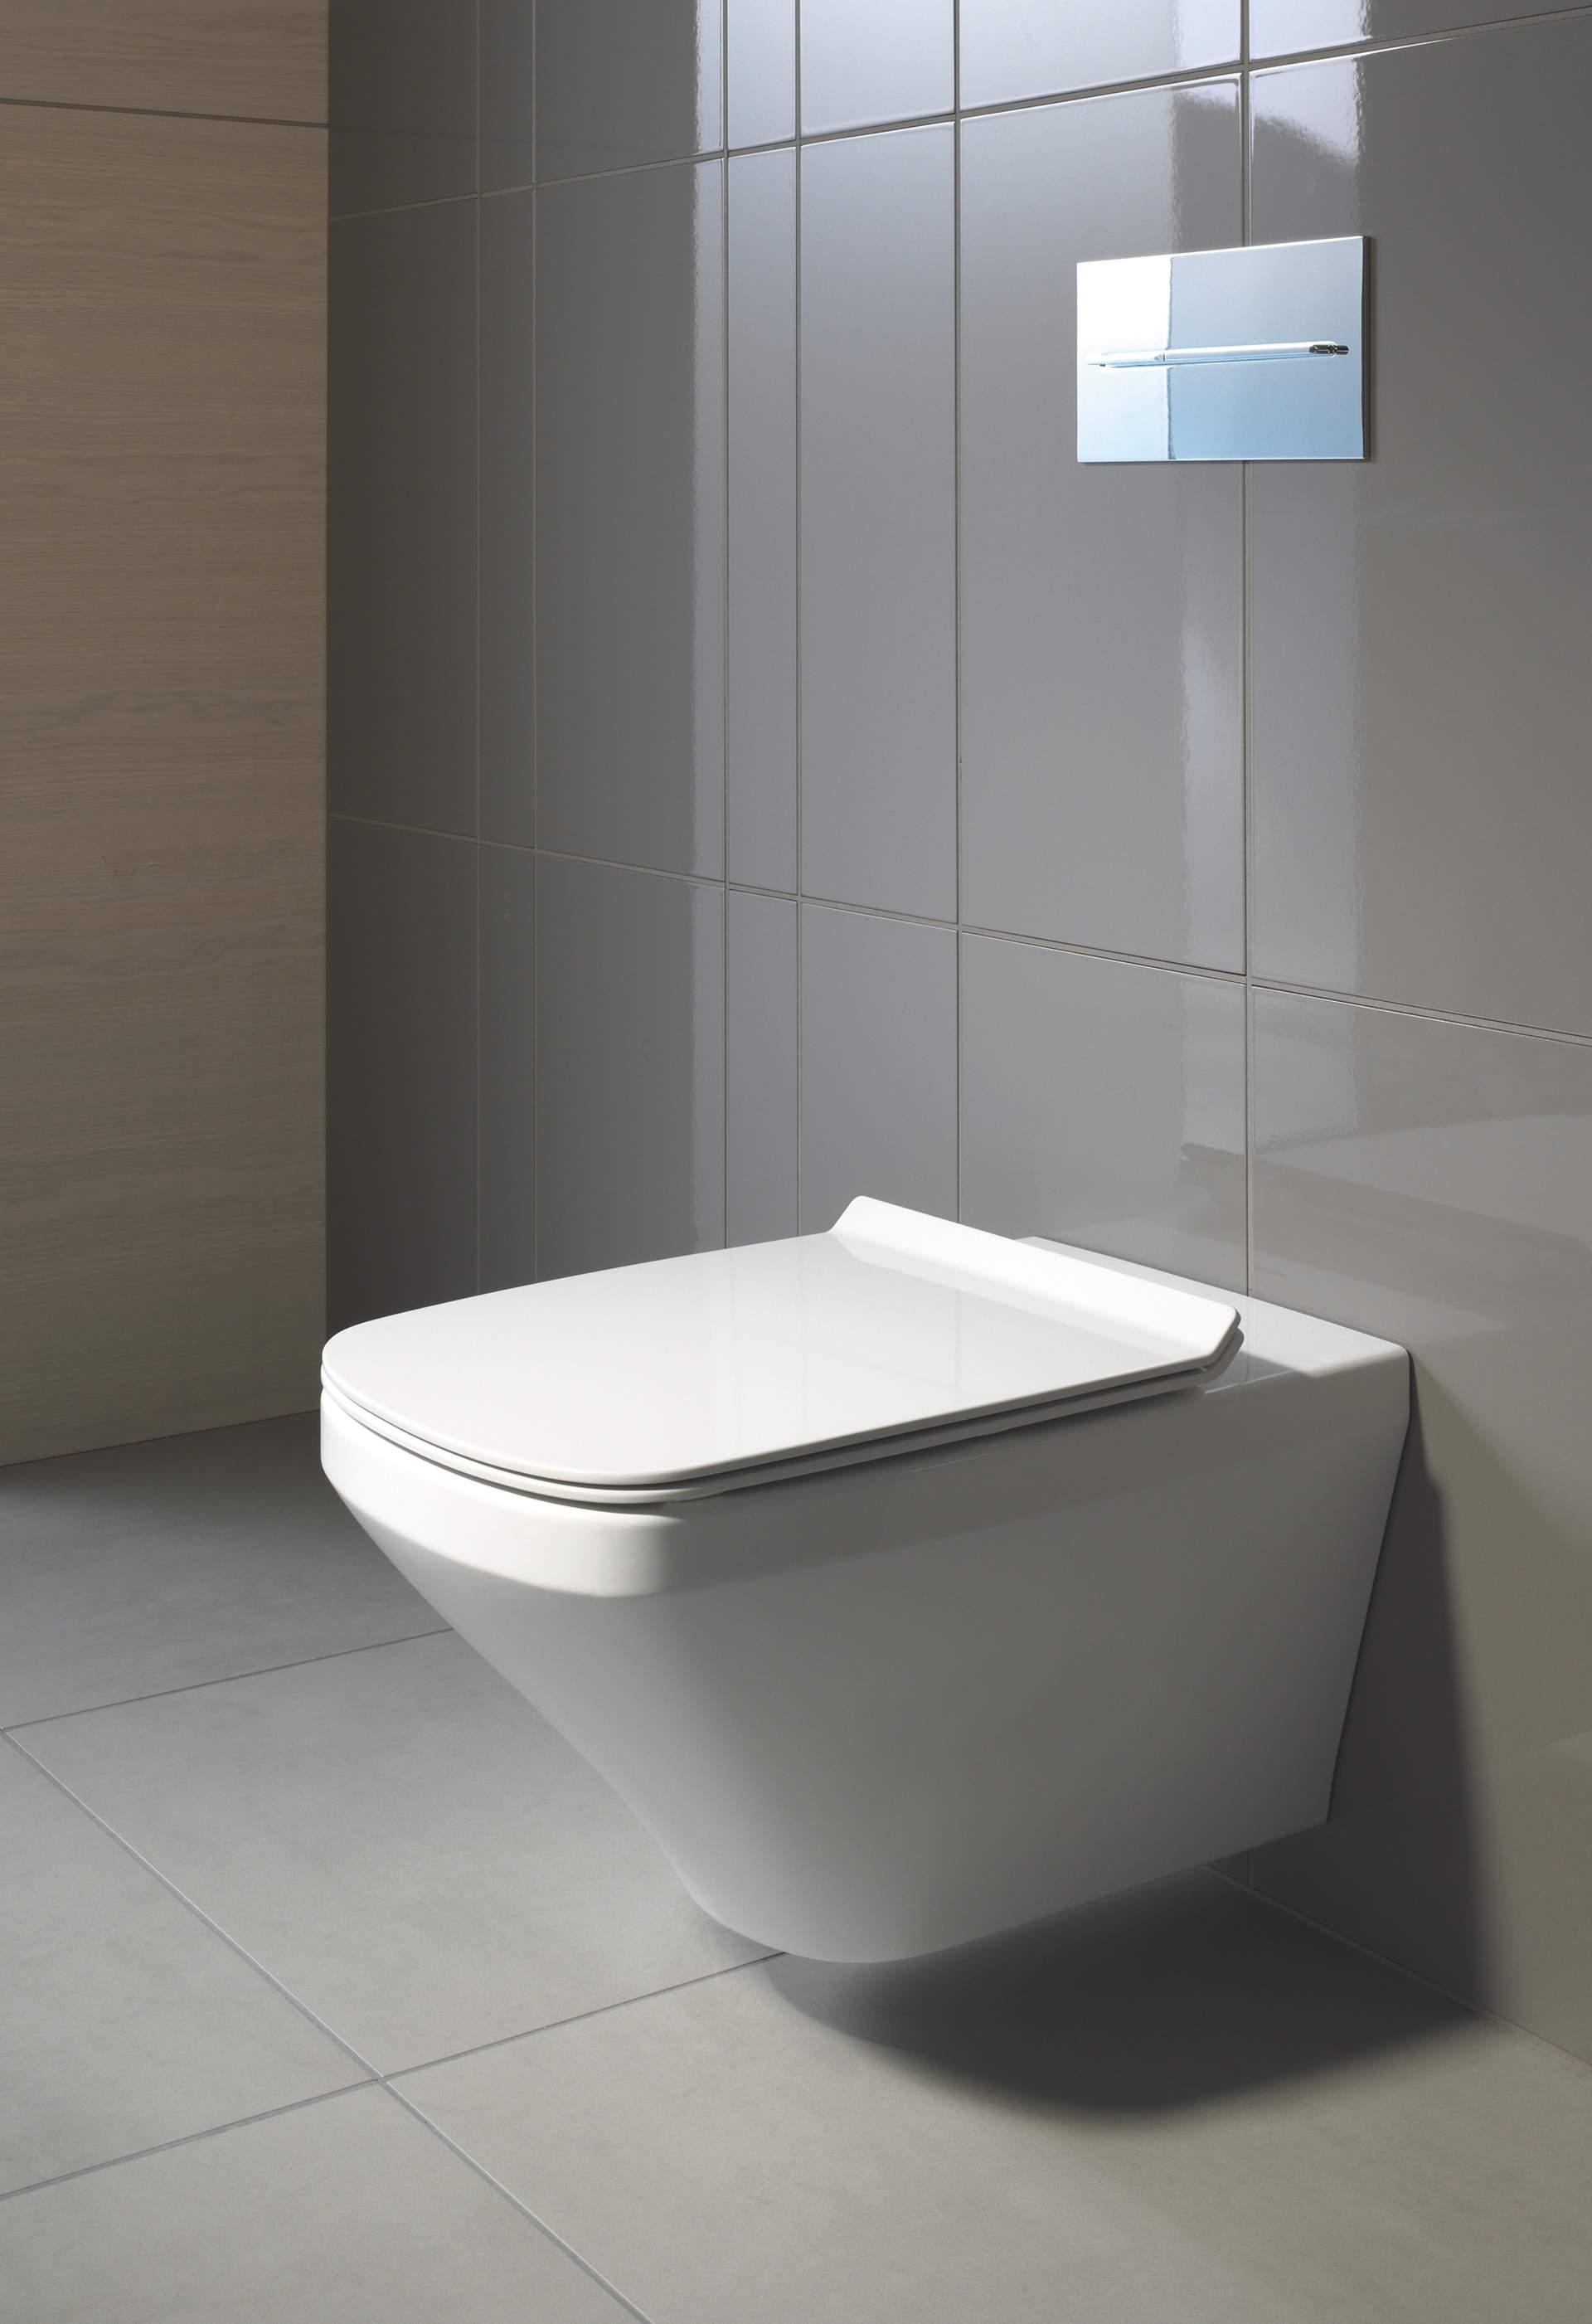 Modern Toilets & WCs for your bathroom | Duravit on beautiful bathrooms, gorgeous bathrooms, fancy bathroom signs, fancy small house, fancy bathroom mirrors, fancy bathroom vanities, fancy bathroom design, fancy bathroom tiles, fancy black bathroom, fancy small appliances, fancy small design, fancy bathroom accessories, nice bathrooms, fancy bathroom showers, big real bathrooms, luxury bathrooms, pretty bathrooms, fancy master bathroom ideas, fancy closets, fancy bathroom sinks,